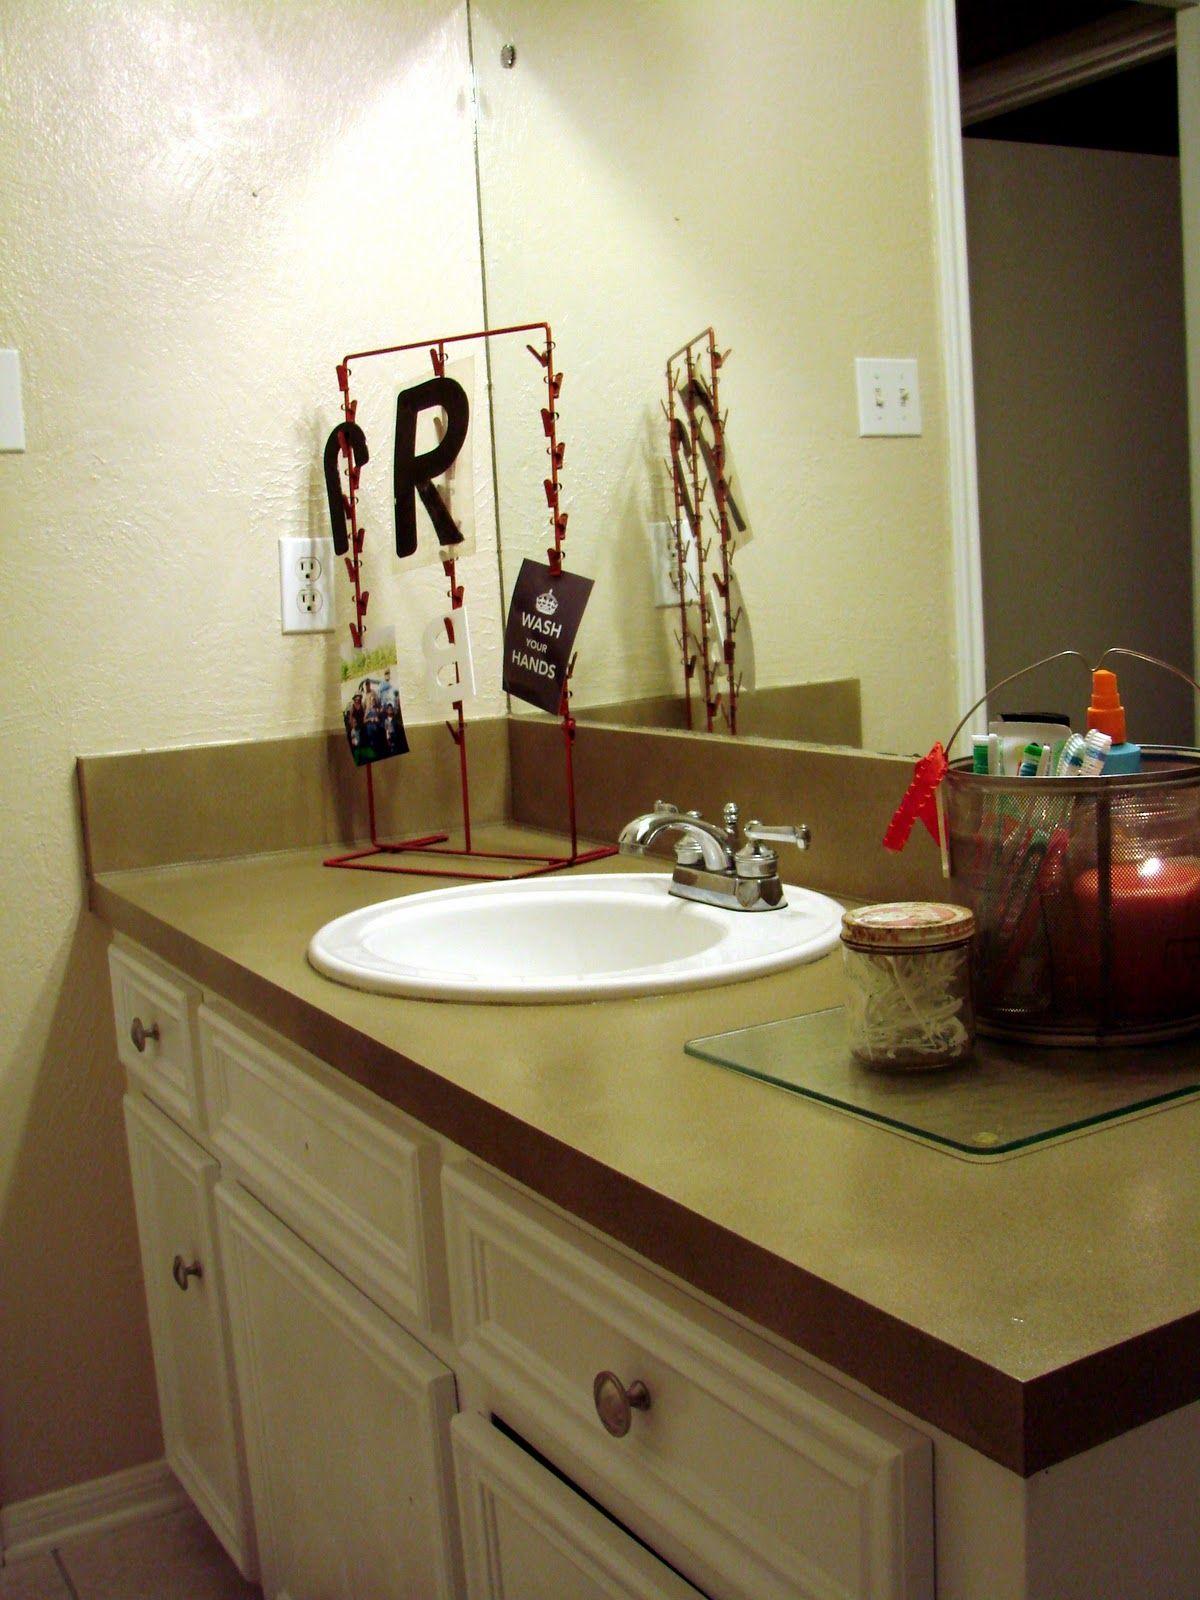 How To Paint Bathroom Countertops Arxiusarquitectura